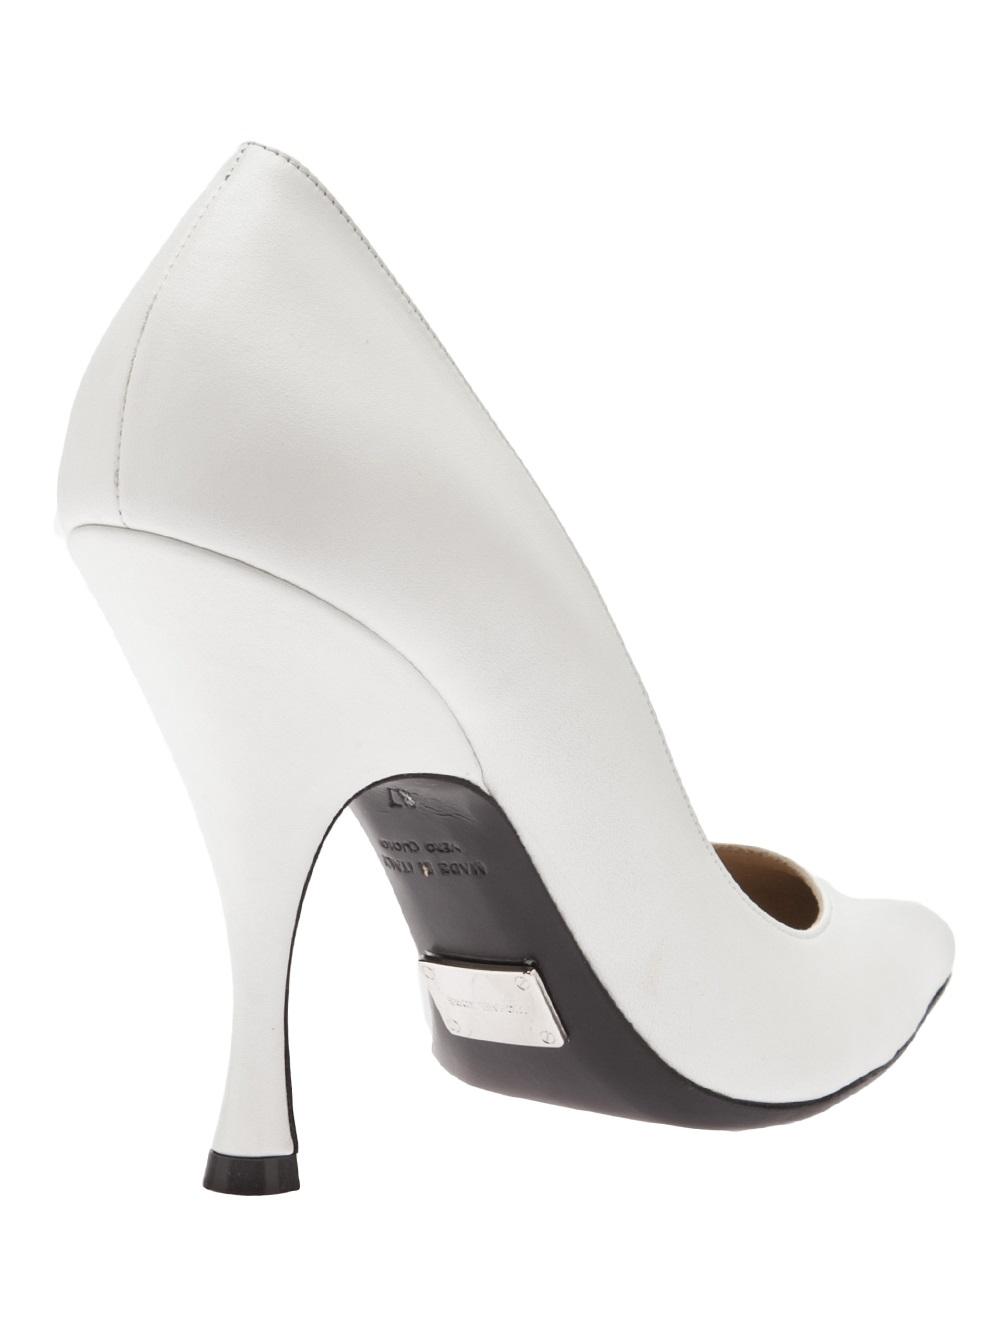 e5b6d2ee3af01 Lyst - Michael Kors Curved Heel Pump in White